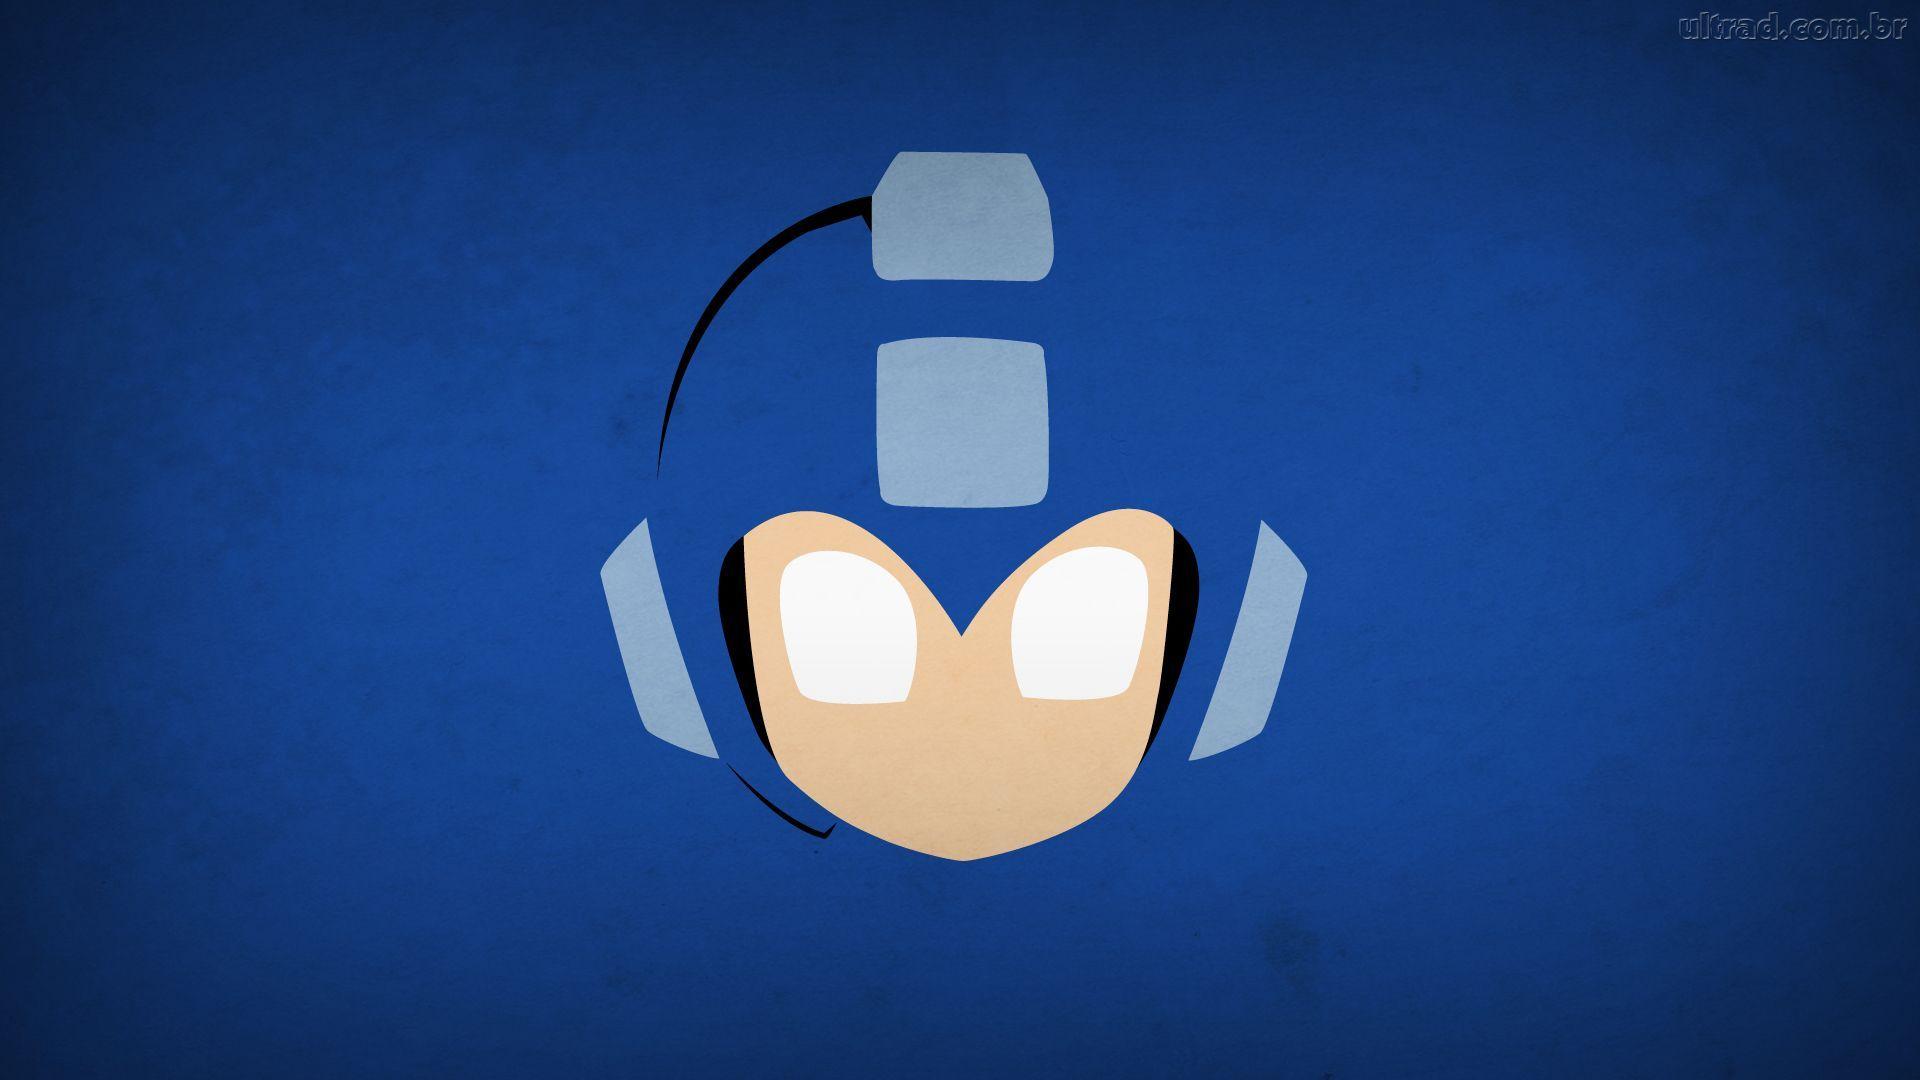 Megaman Wallpaper Hd Free Download Anime Cartel De Superheroes Posters Minimalistas Cartel Minimalista